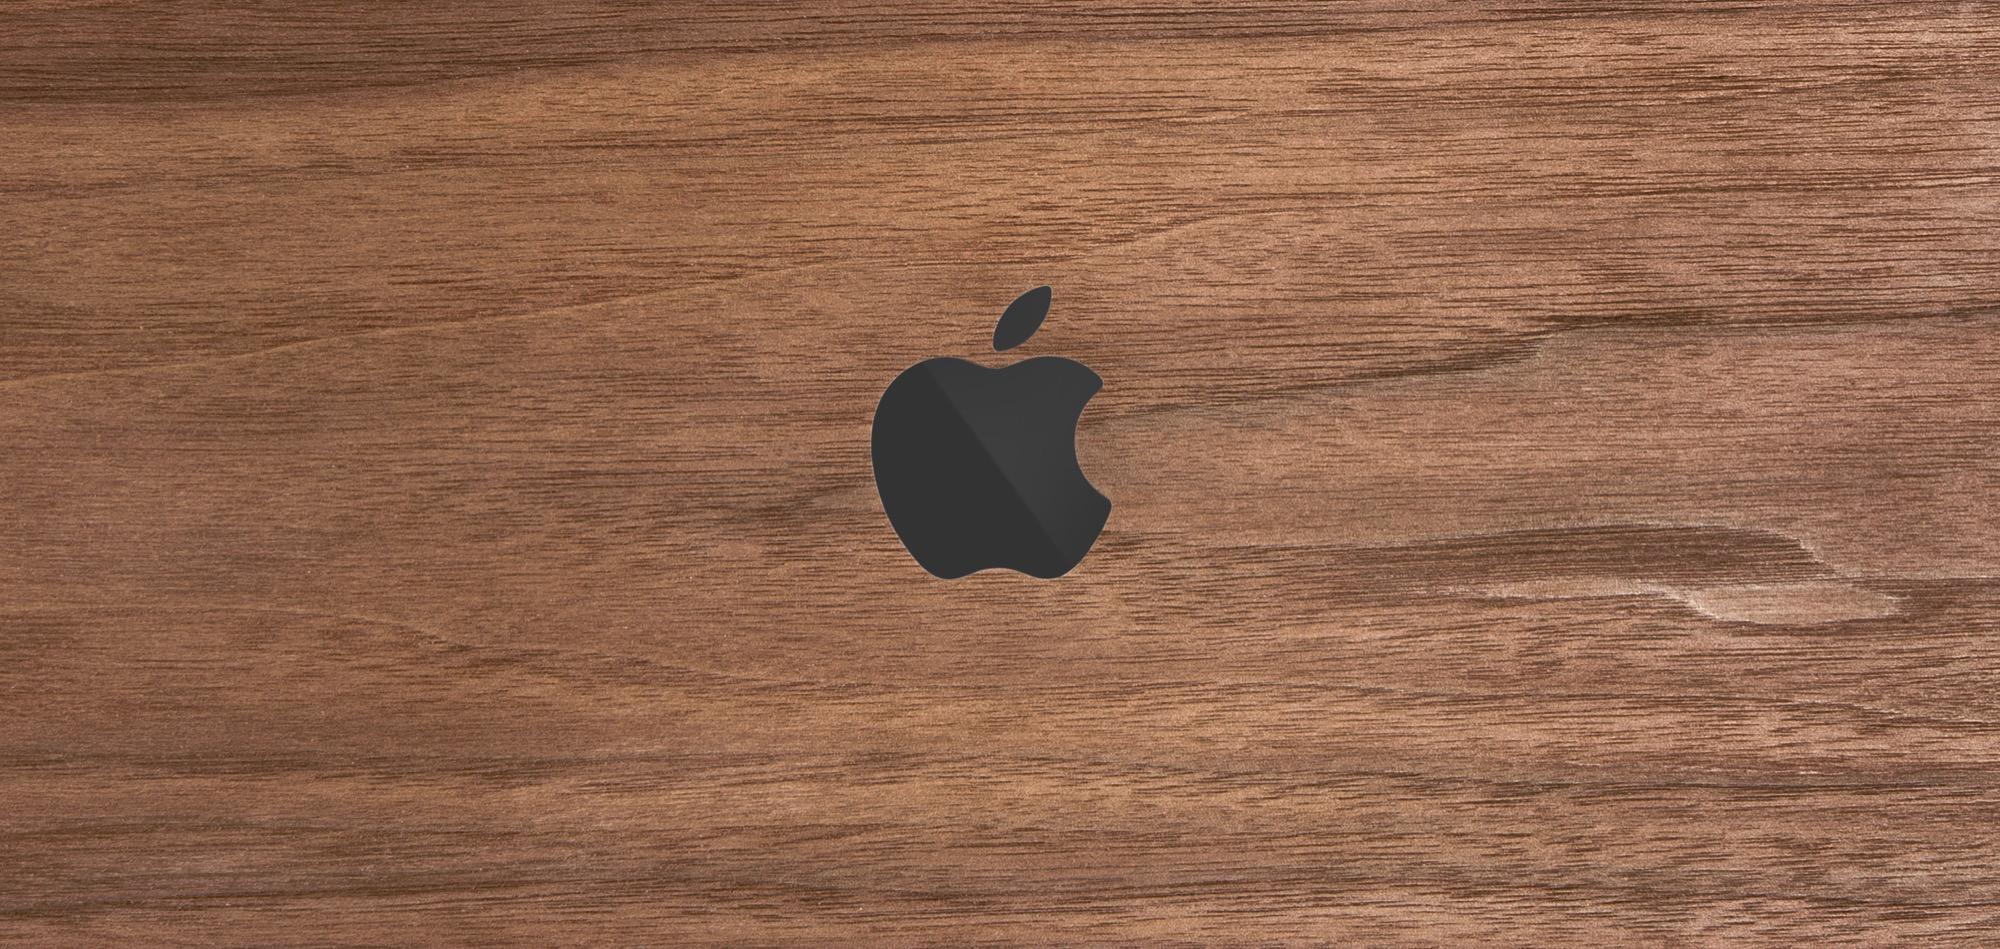 woodcessories-holz-macbook-cover-pro-touchbar-2016-15-13-sticker-klebefolie-decal-woodFolie1